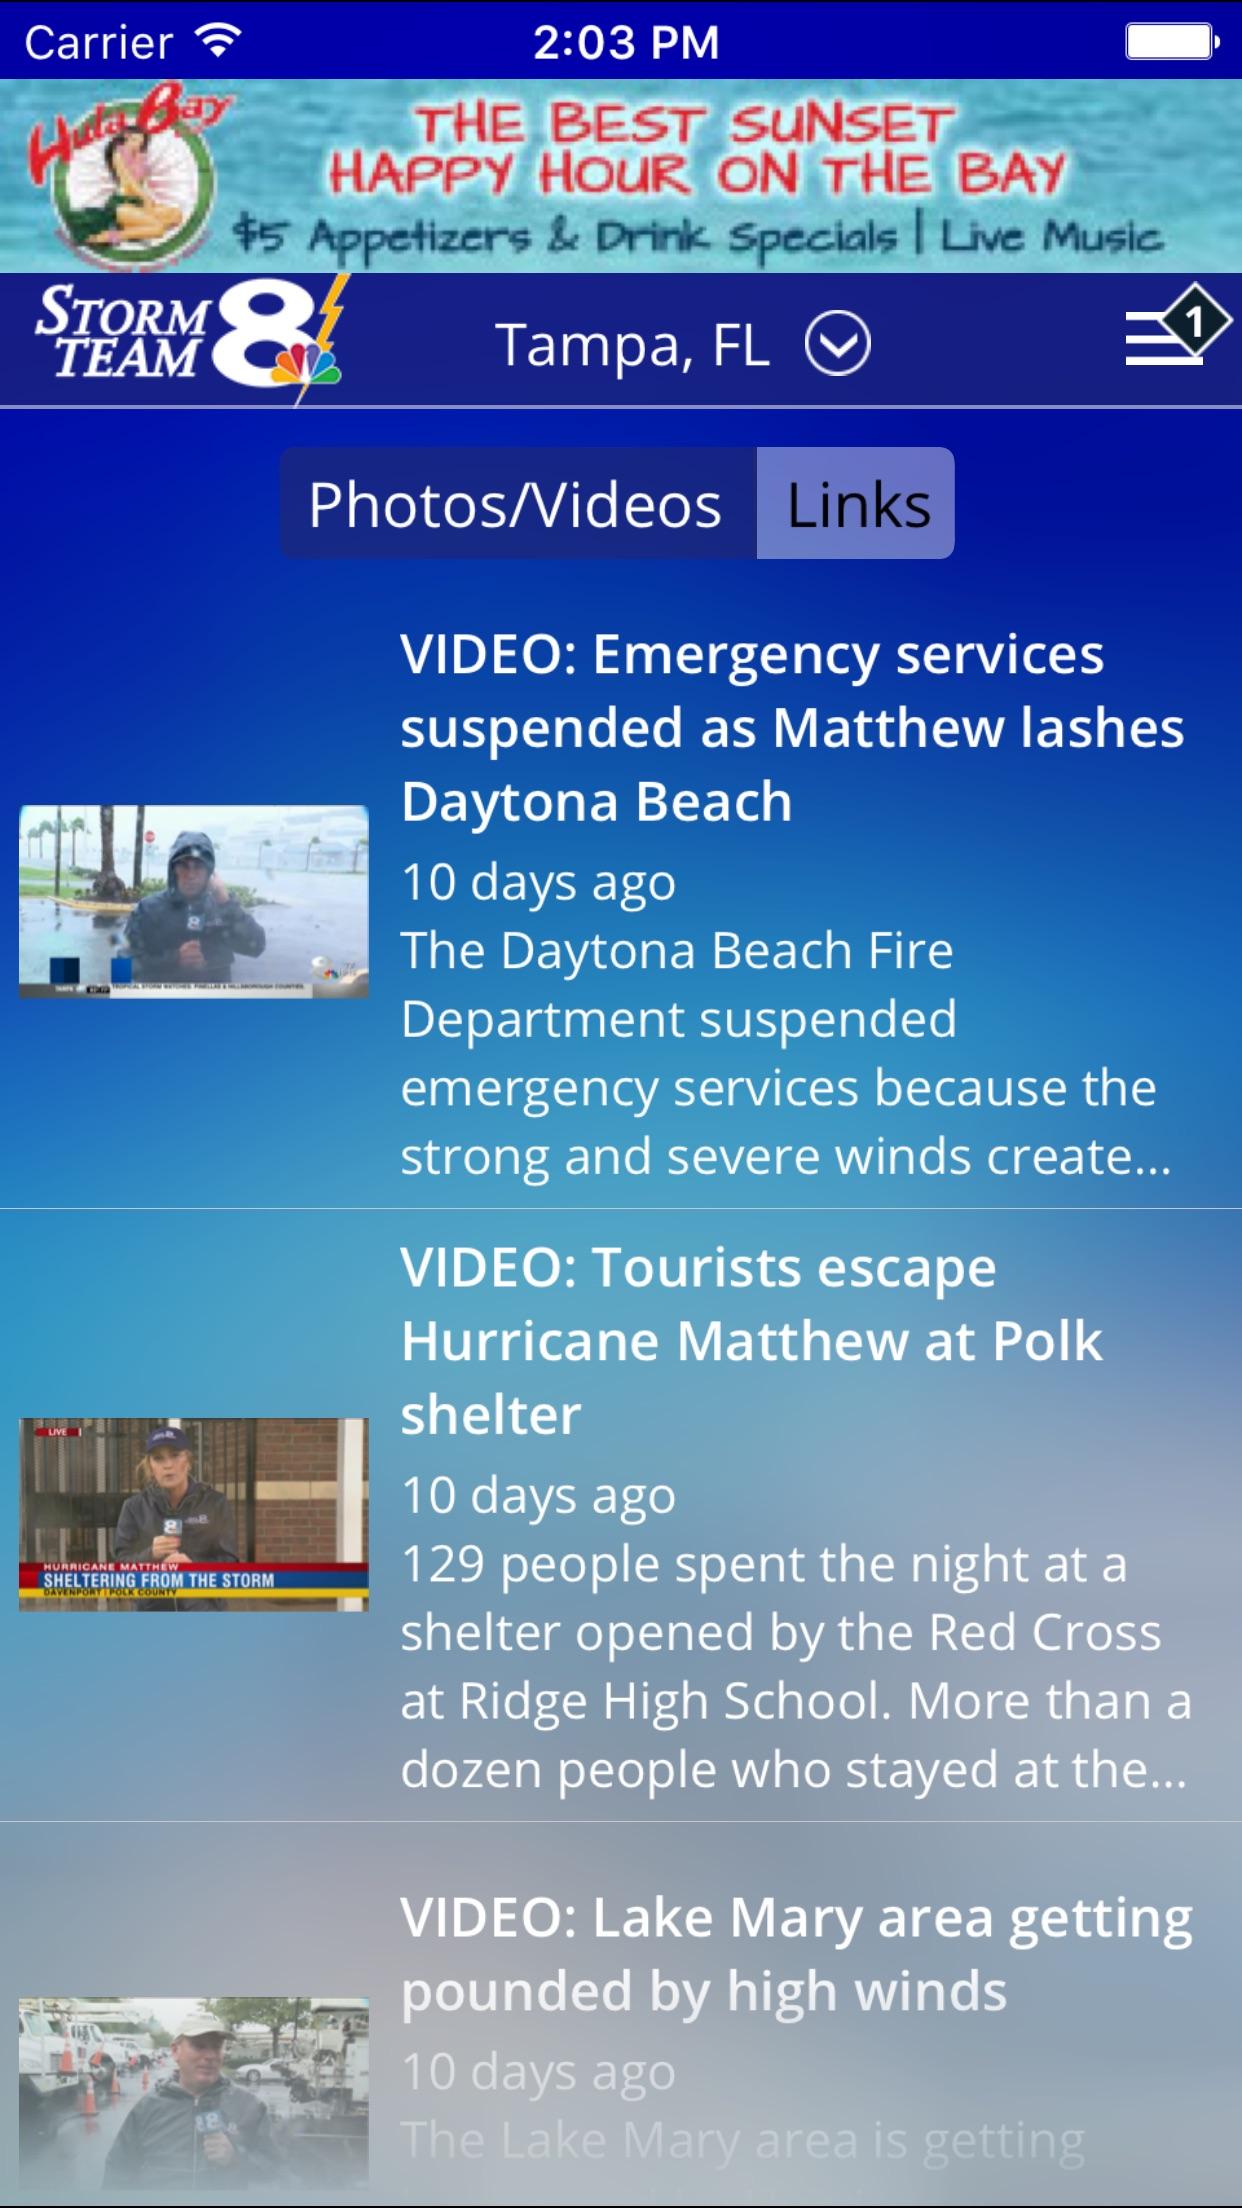 Storm Team 8 - WFLA - Weather Max - Tampa Screenshot